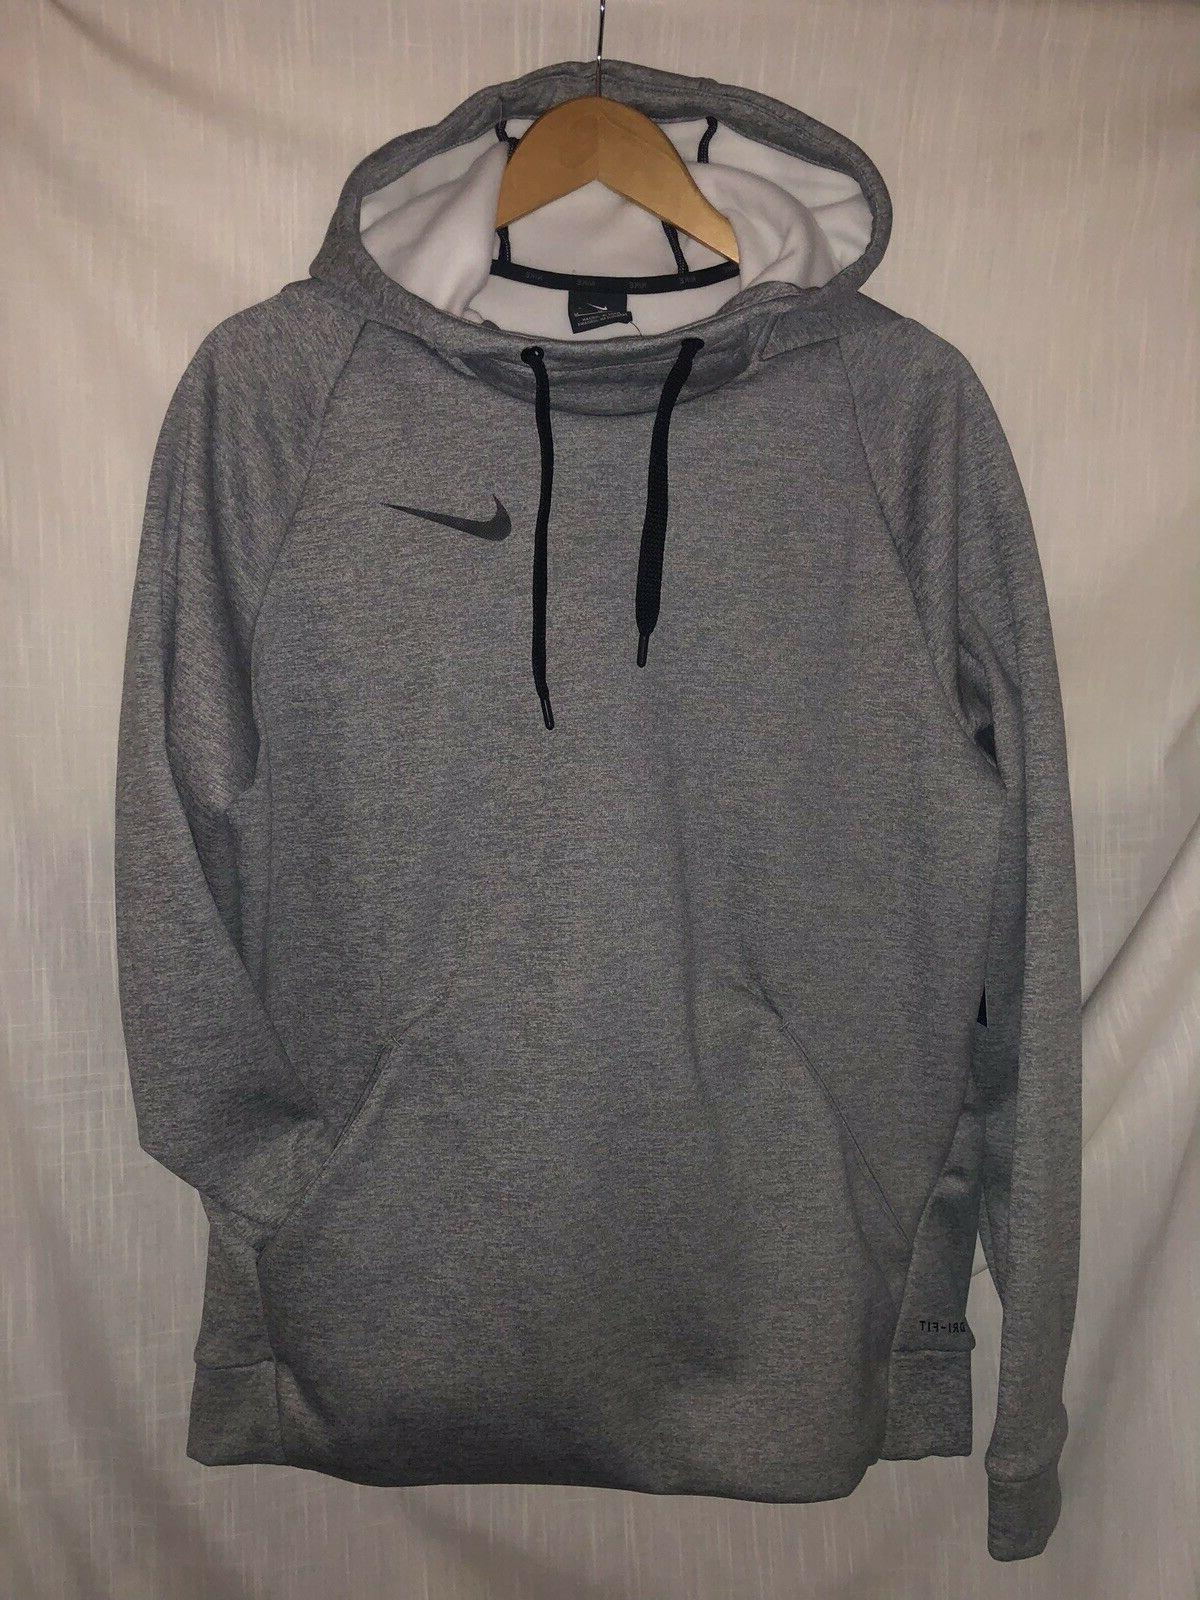 Nike Therma Suit Heather/Black Sz Medium